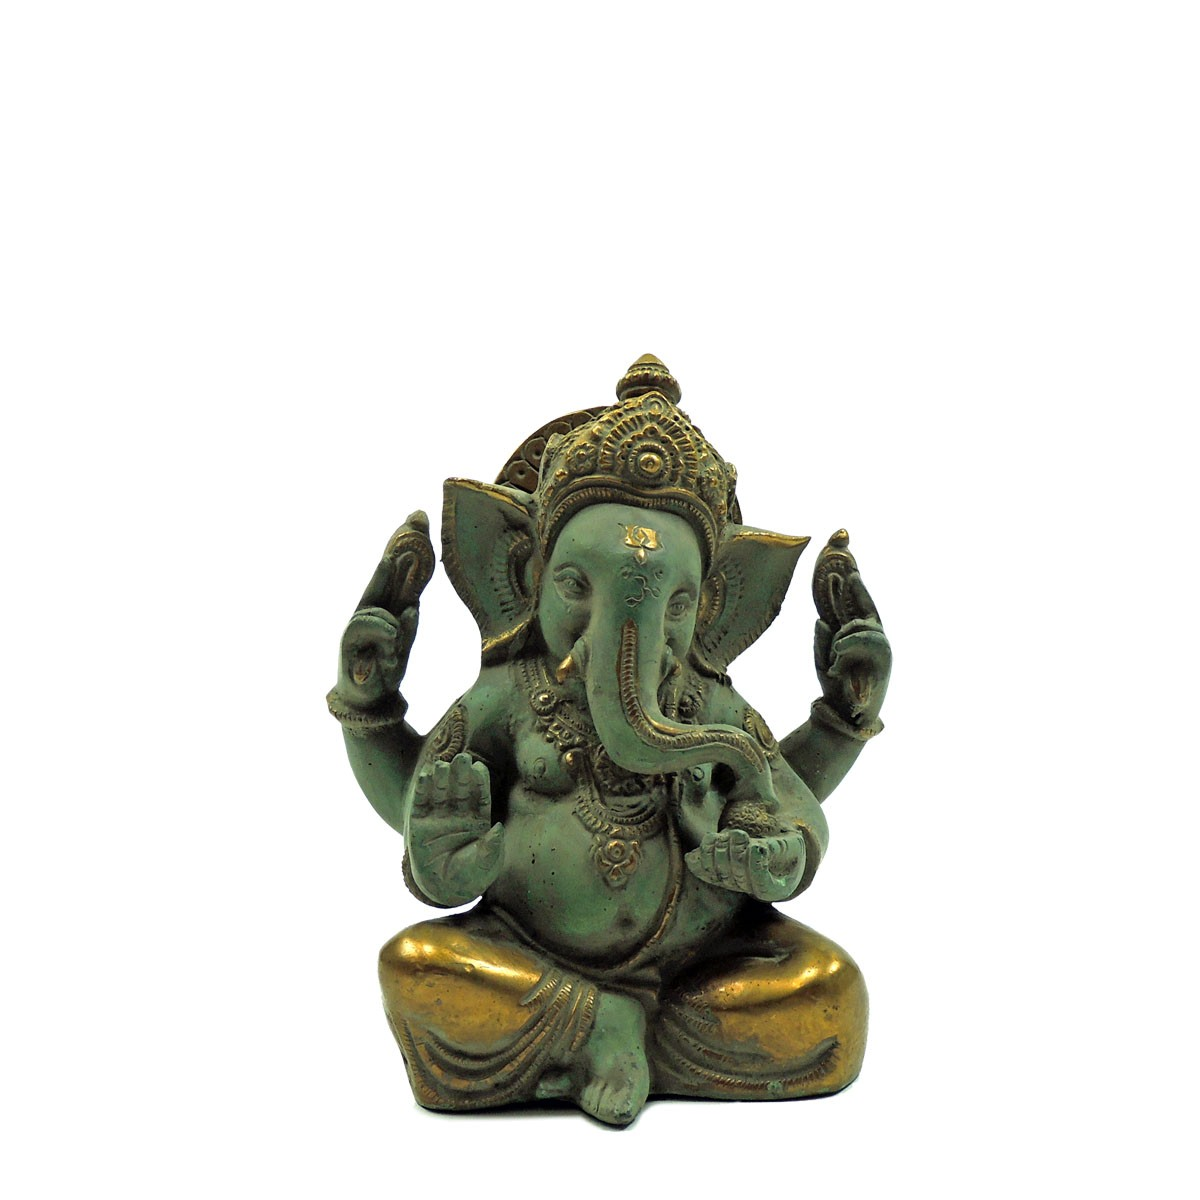 "Messingfigur ""Ganesha"" ca. 18 cm - Farbe Gold/Lightgreen - Handwerk Indien"